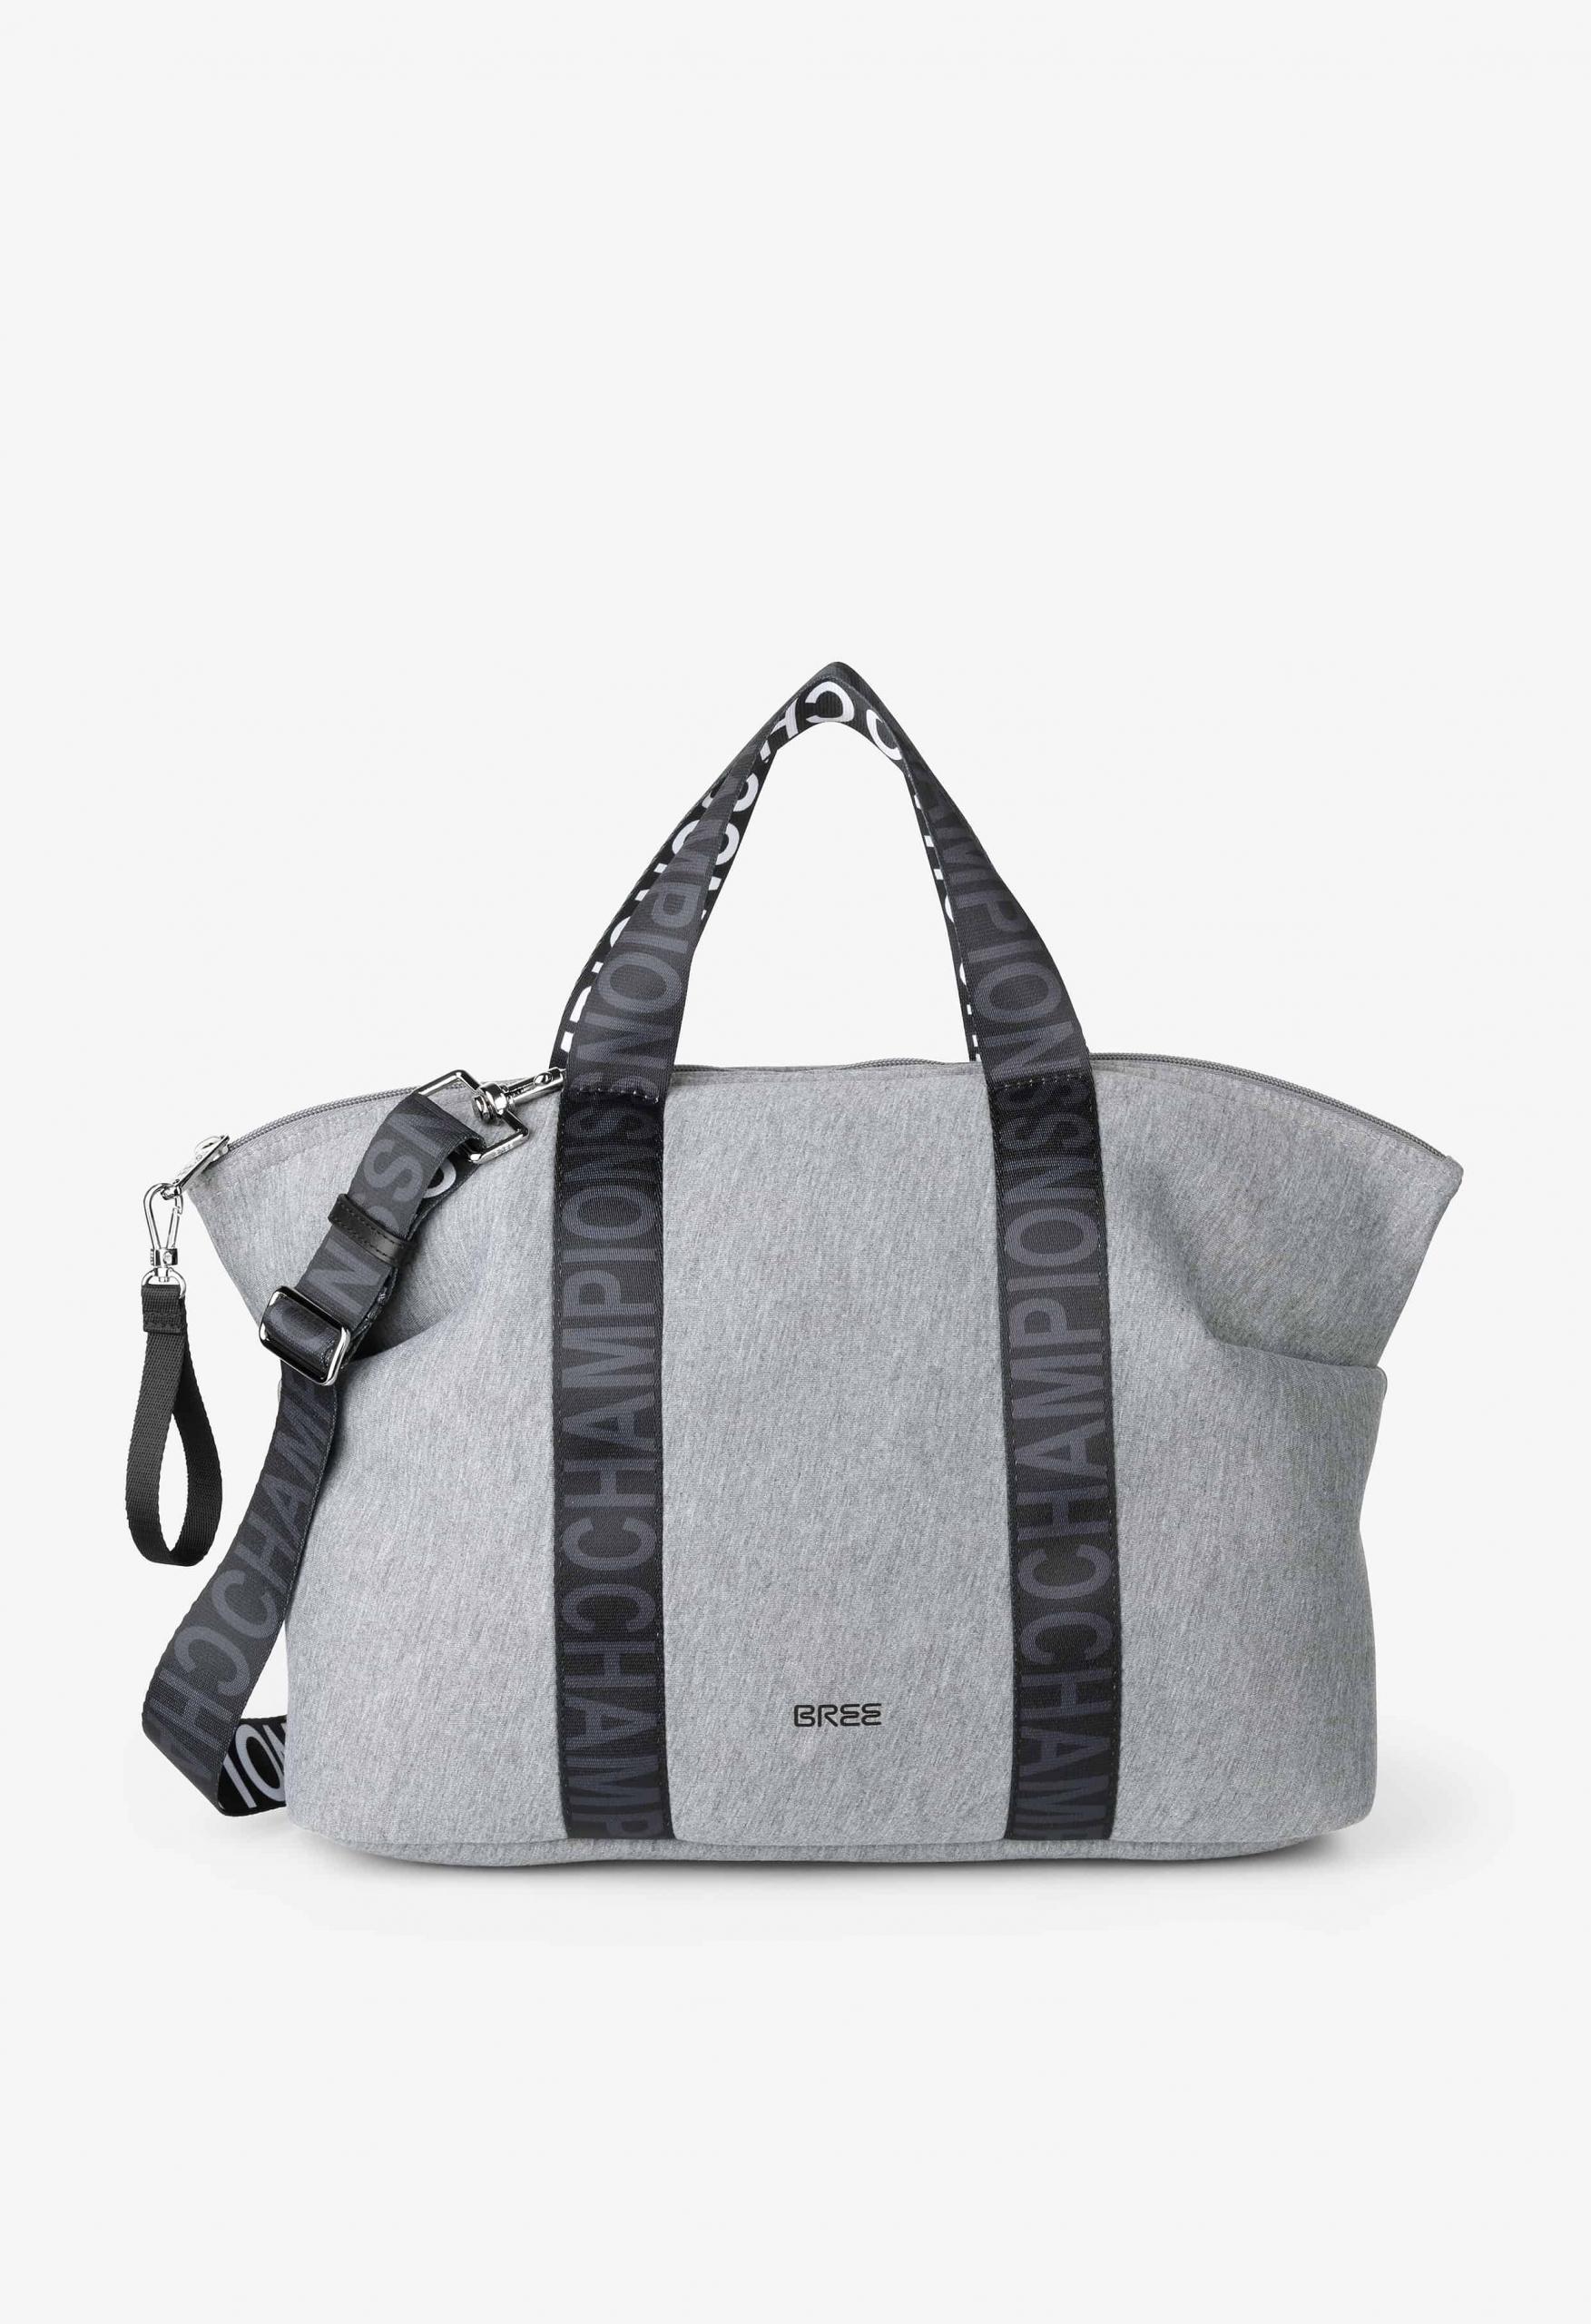 Bree Icon bag handtasche shopper 362920004